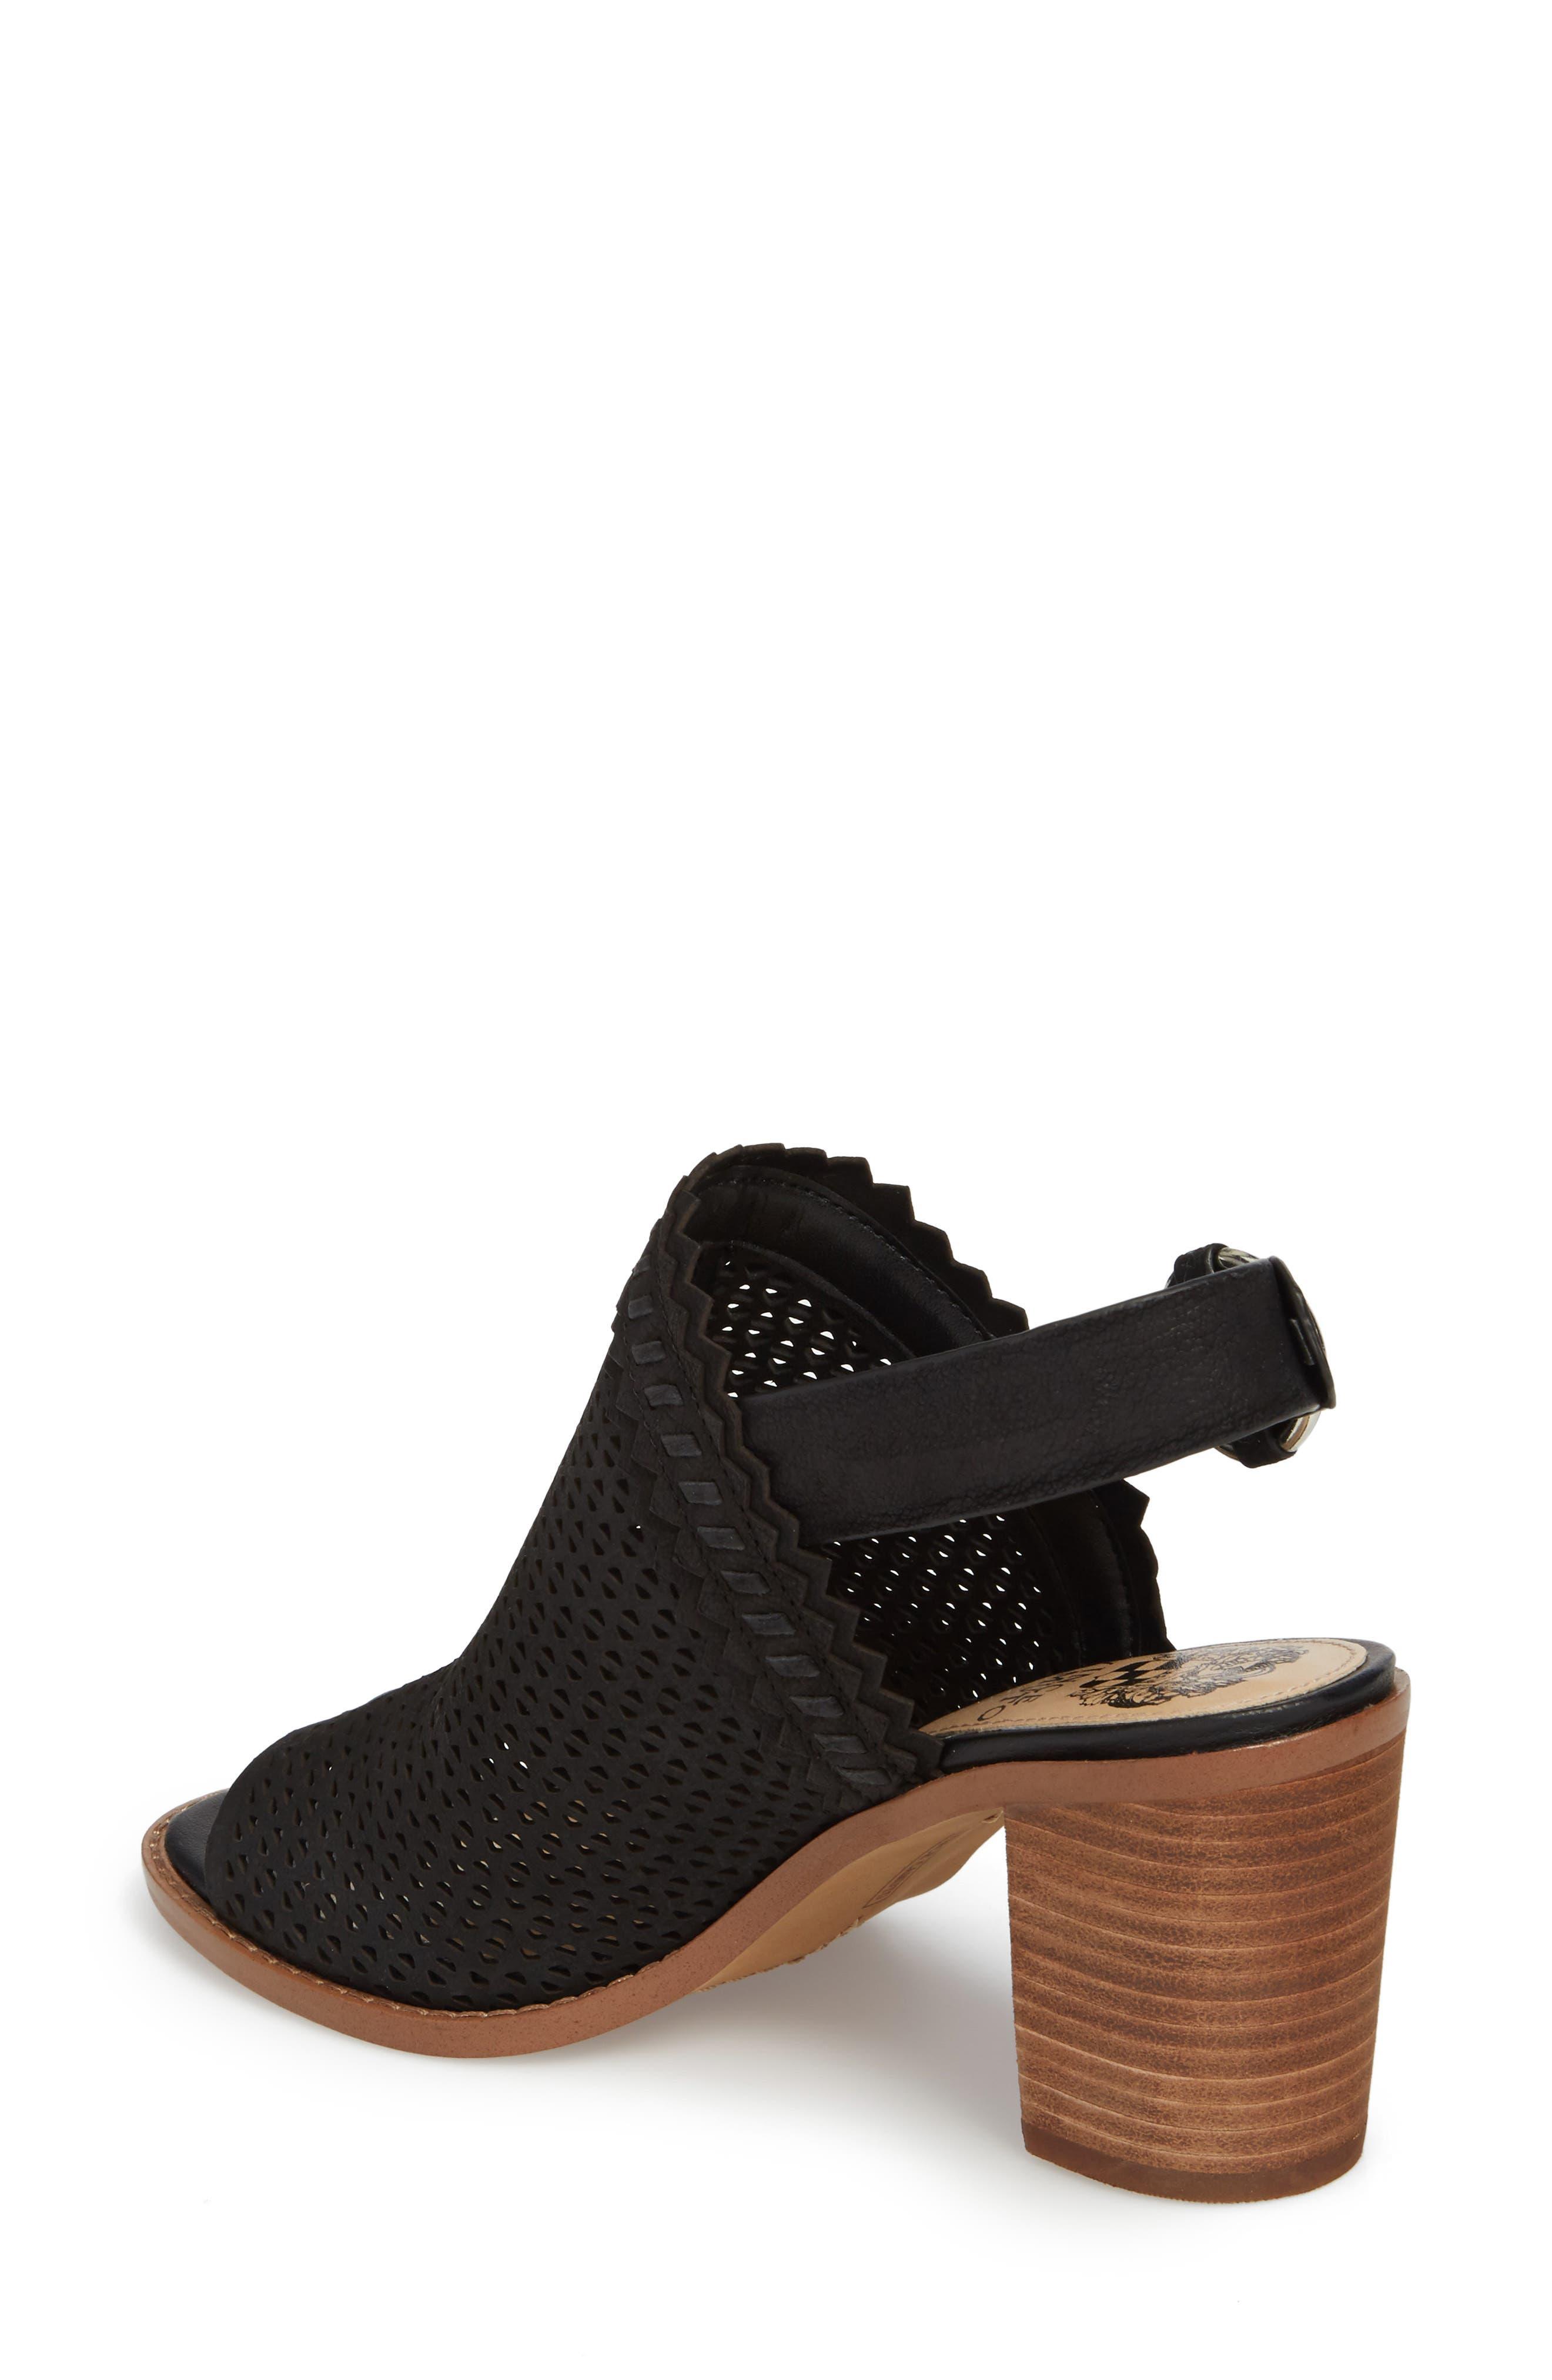 Tricinda Block Heel Sandal,                             Alternate thumbnail 2, color,                             BLACK LEATHER